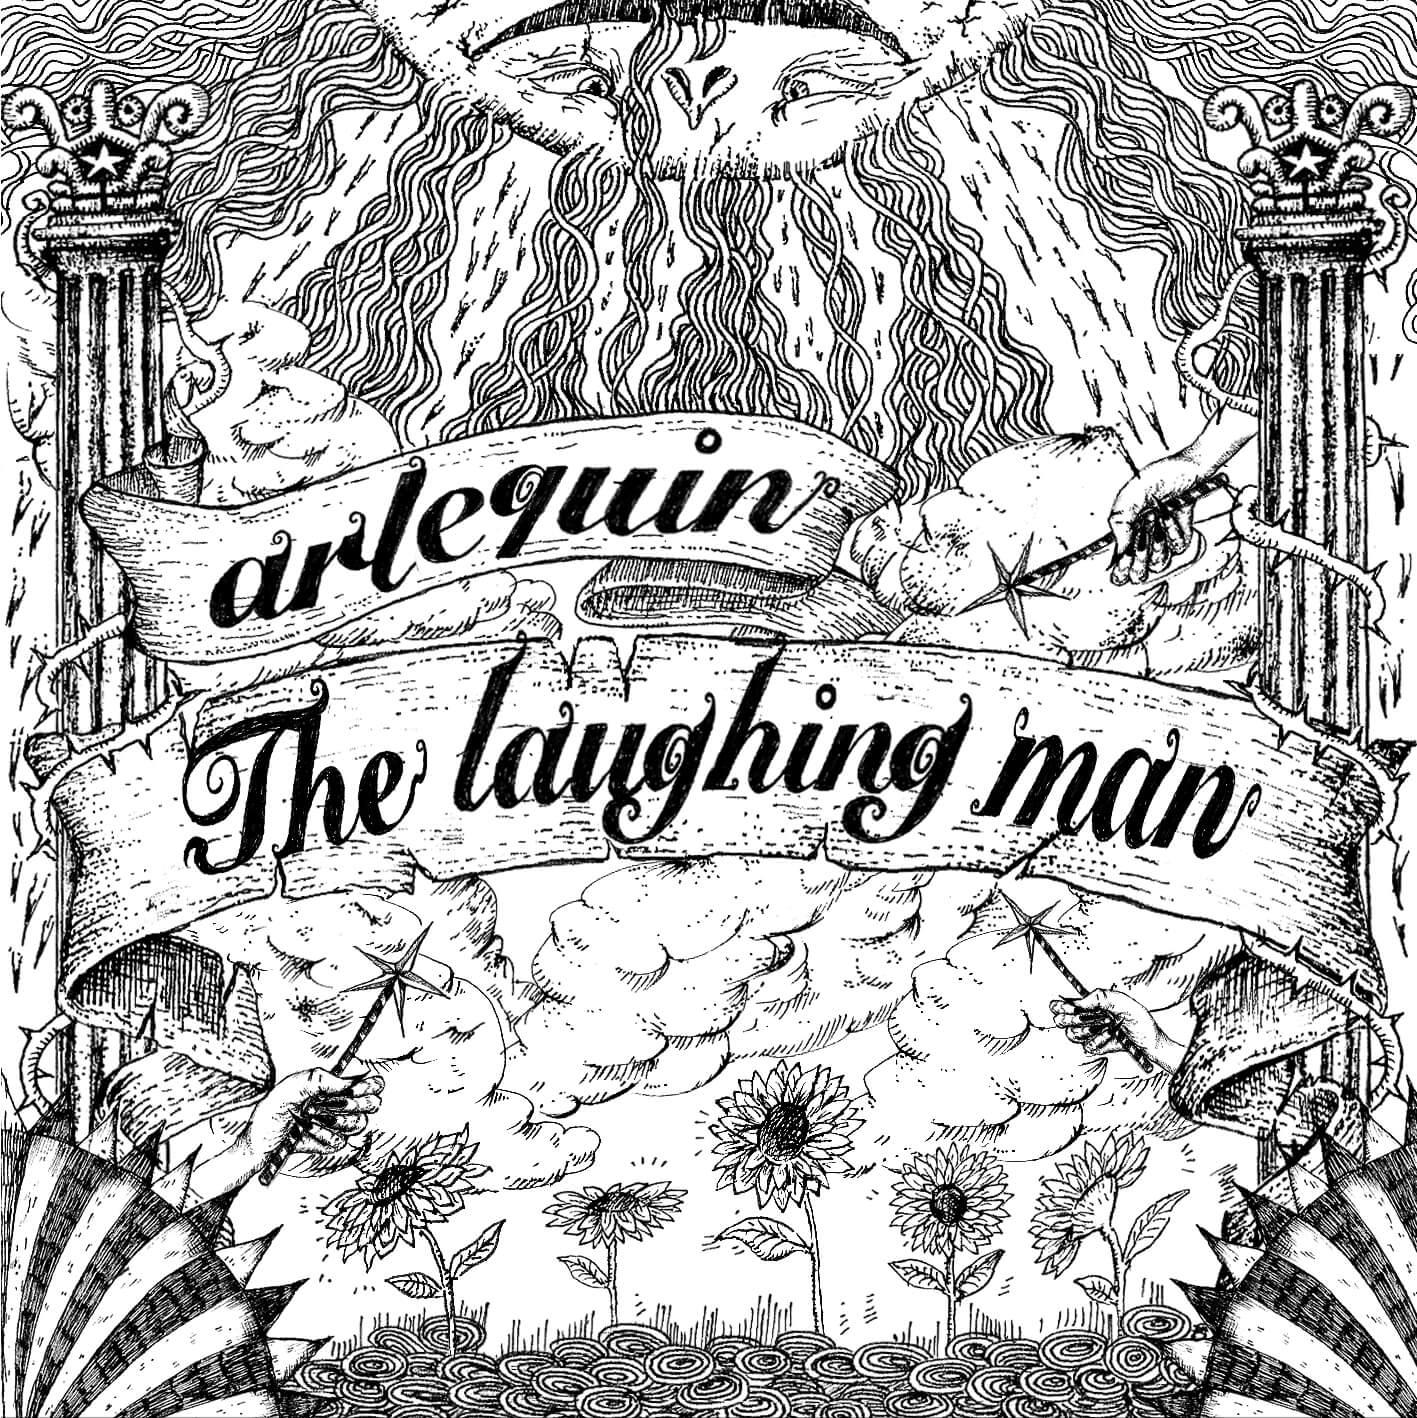 「The laughing man」【通常盤】